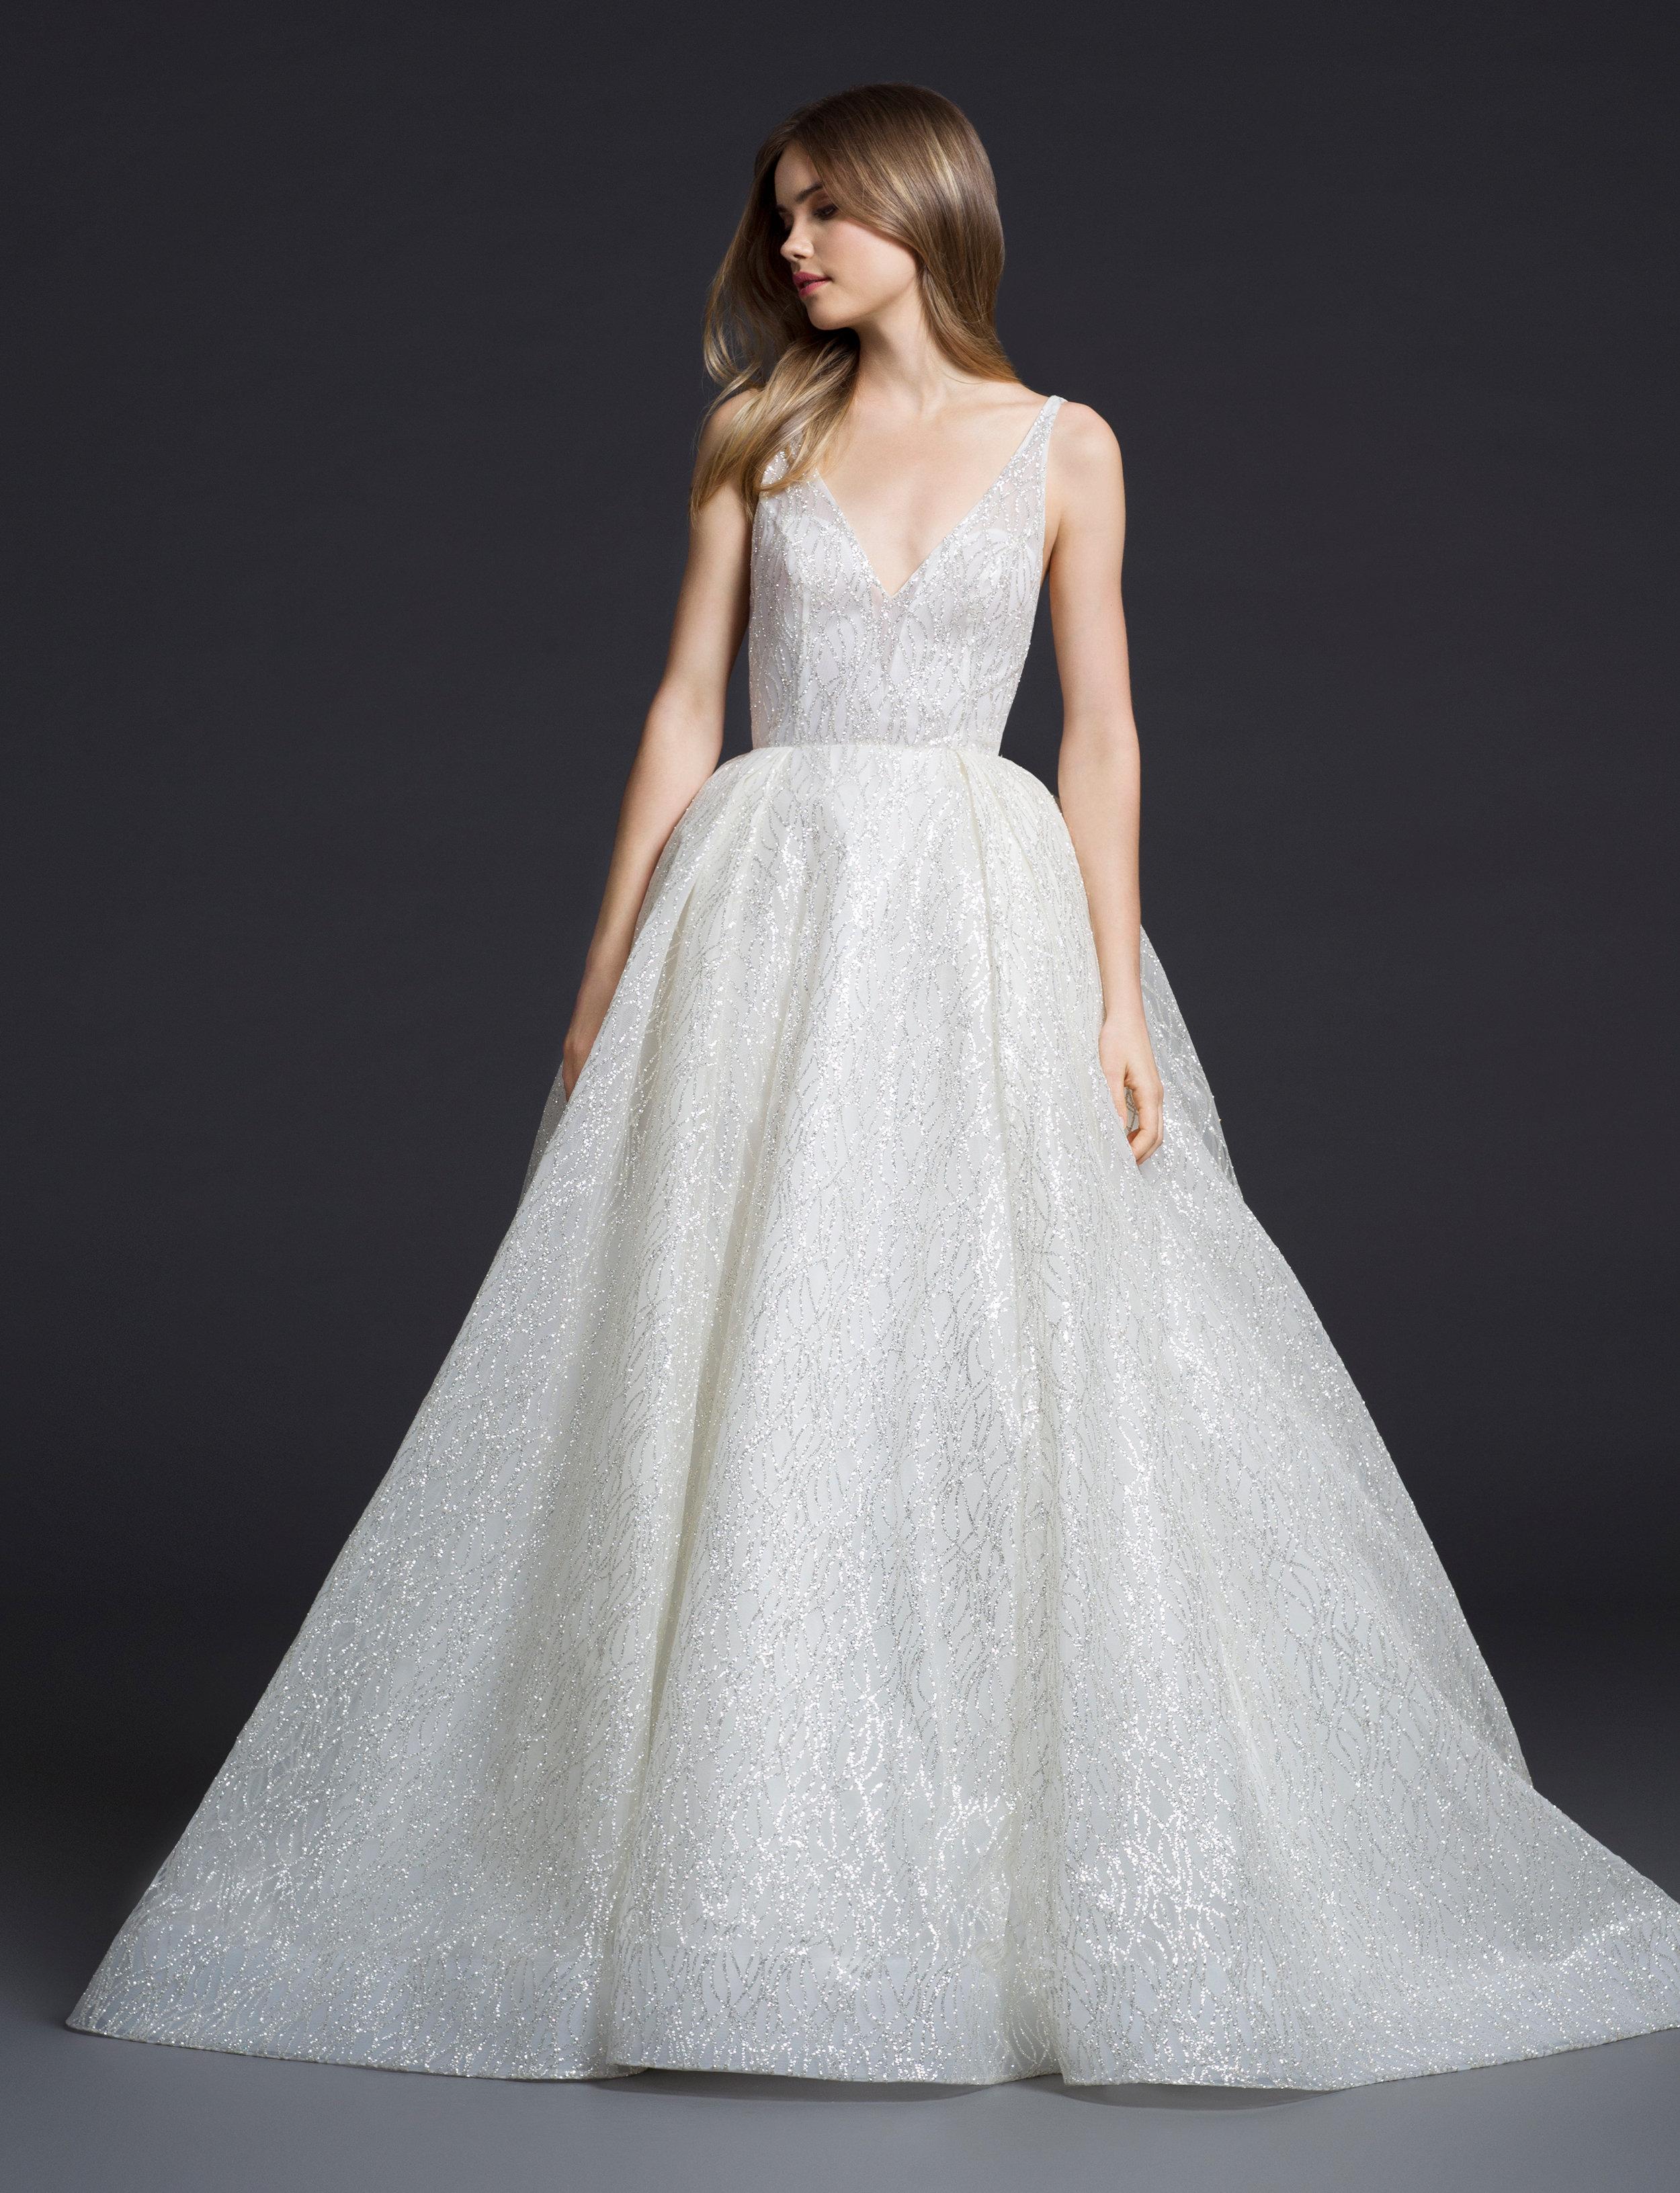 Lazaro wedding dress 2018 images